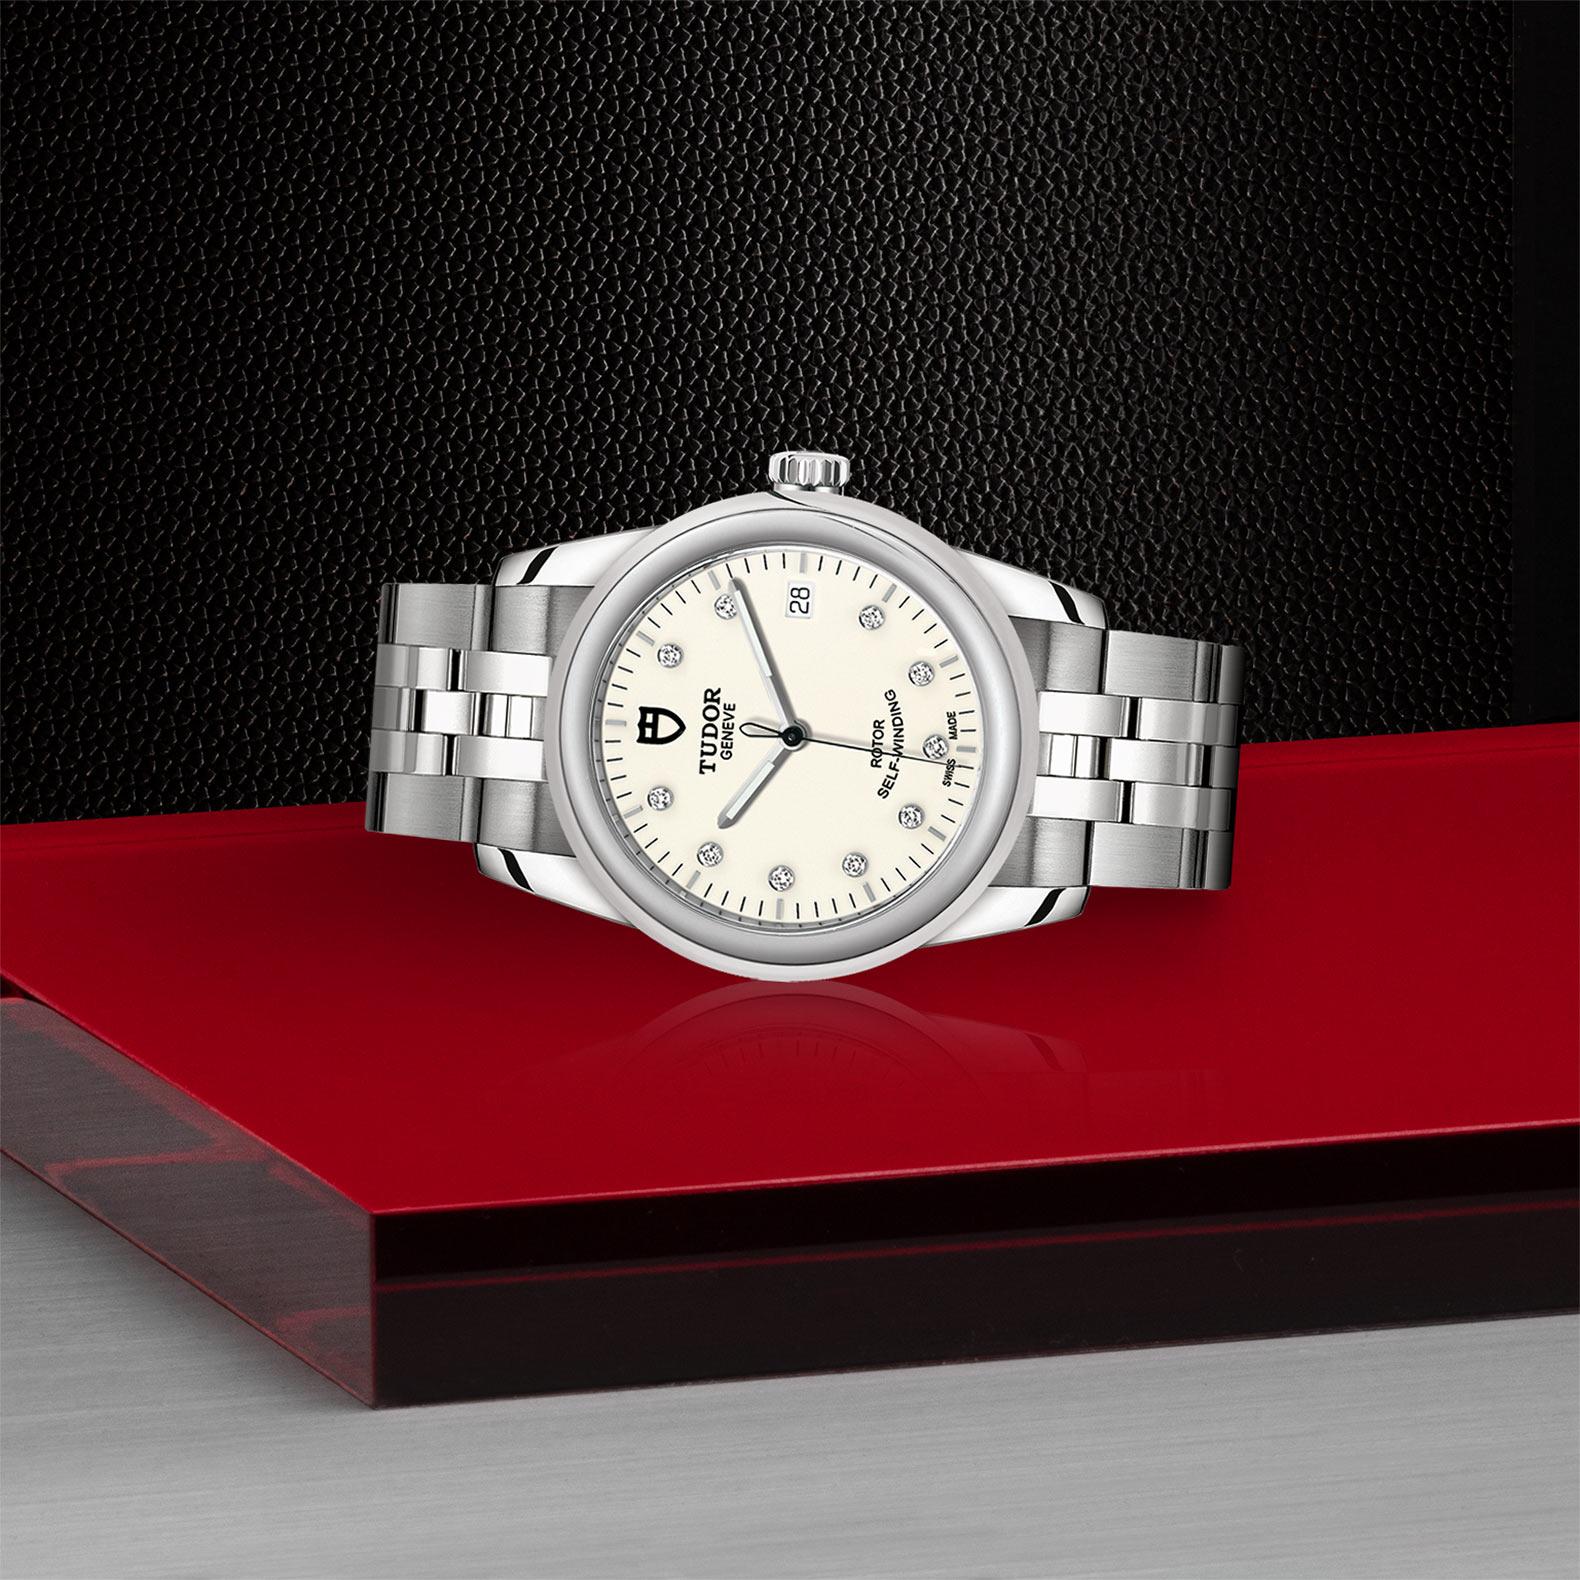 TUDOR Glamour Date - M55000-0104